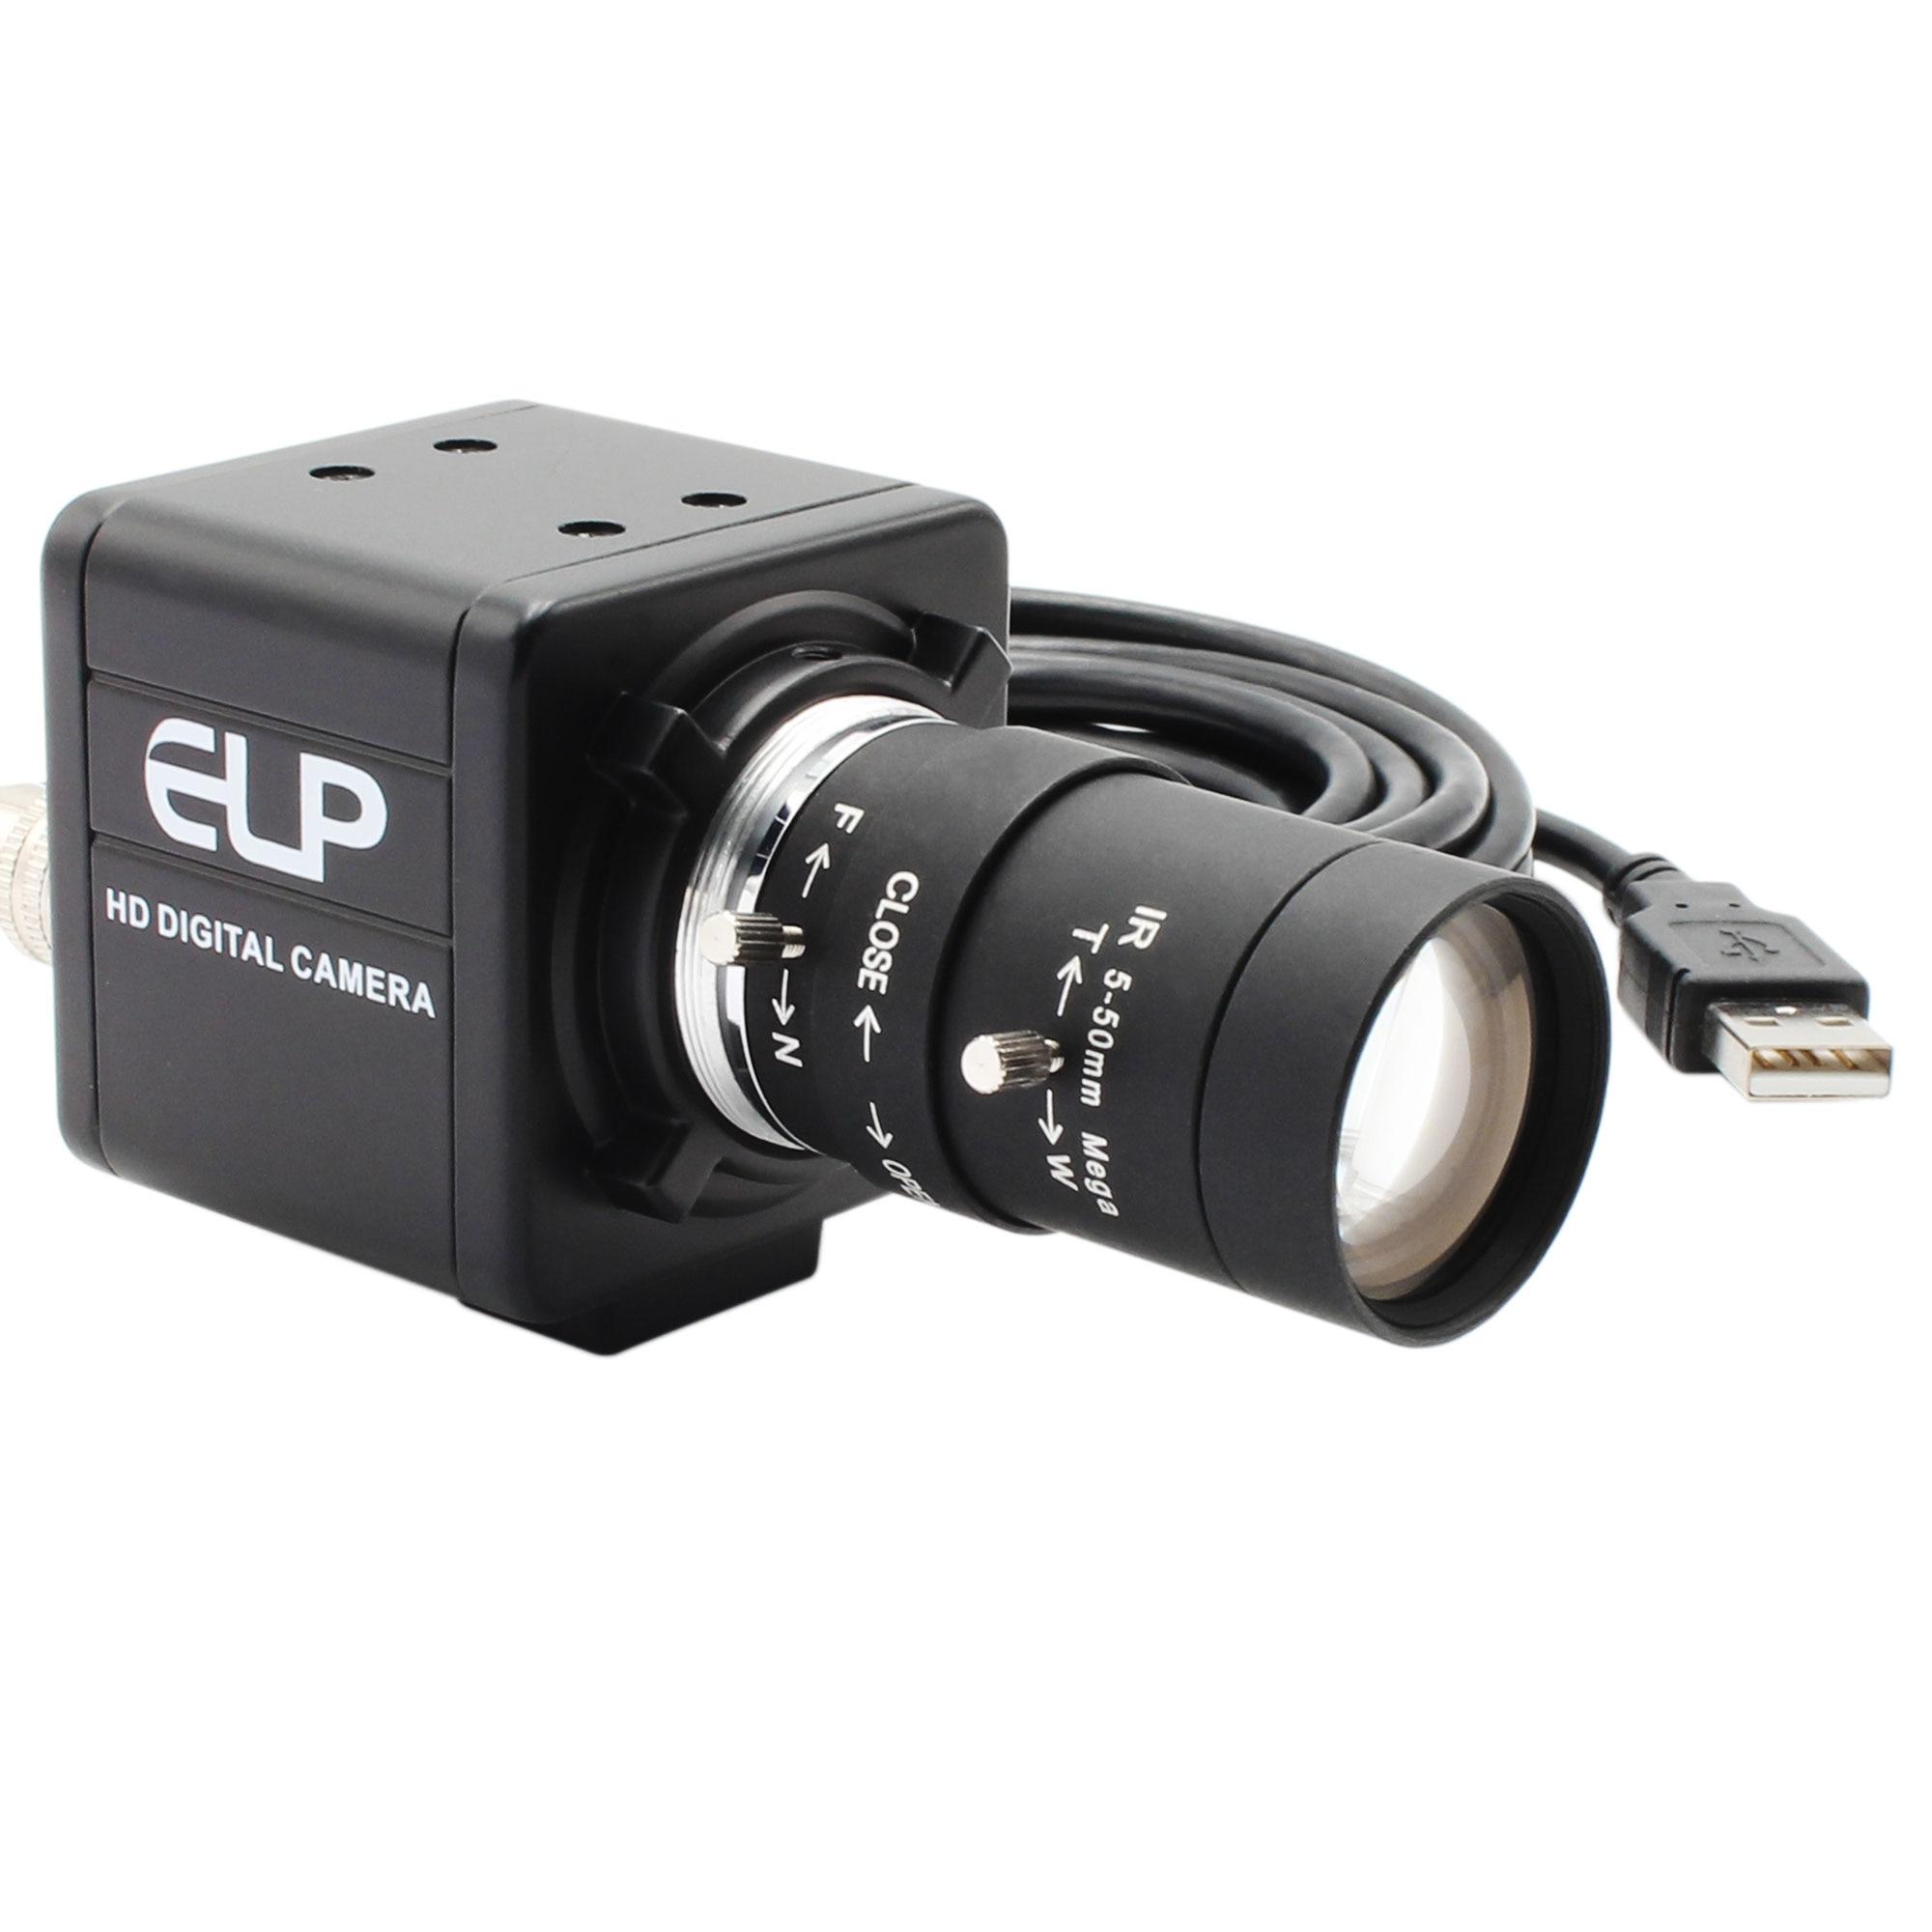 5MP 2592*1944 High Resolution Manual Zoom Varifocal CS Lens Aptina MI5100 High Speed 1080P 30fps Mini CCTV USB Webcam Camera